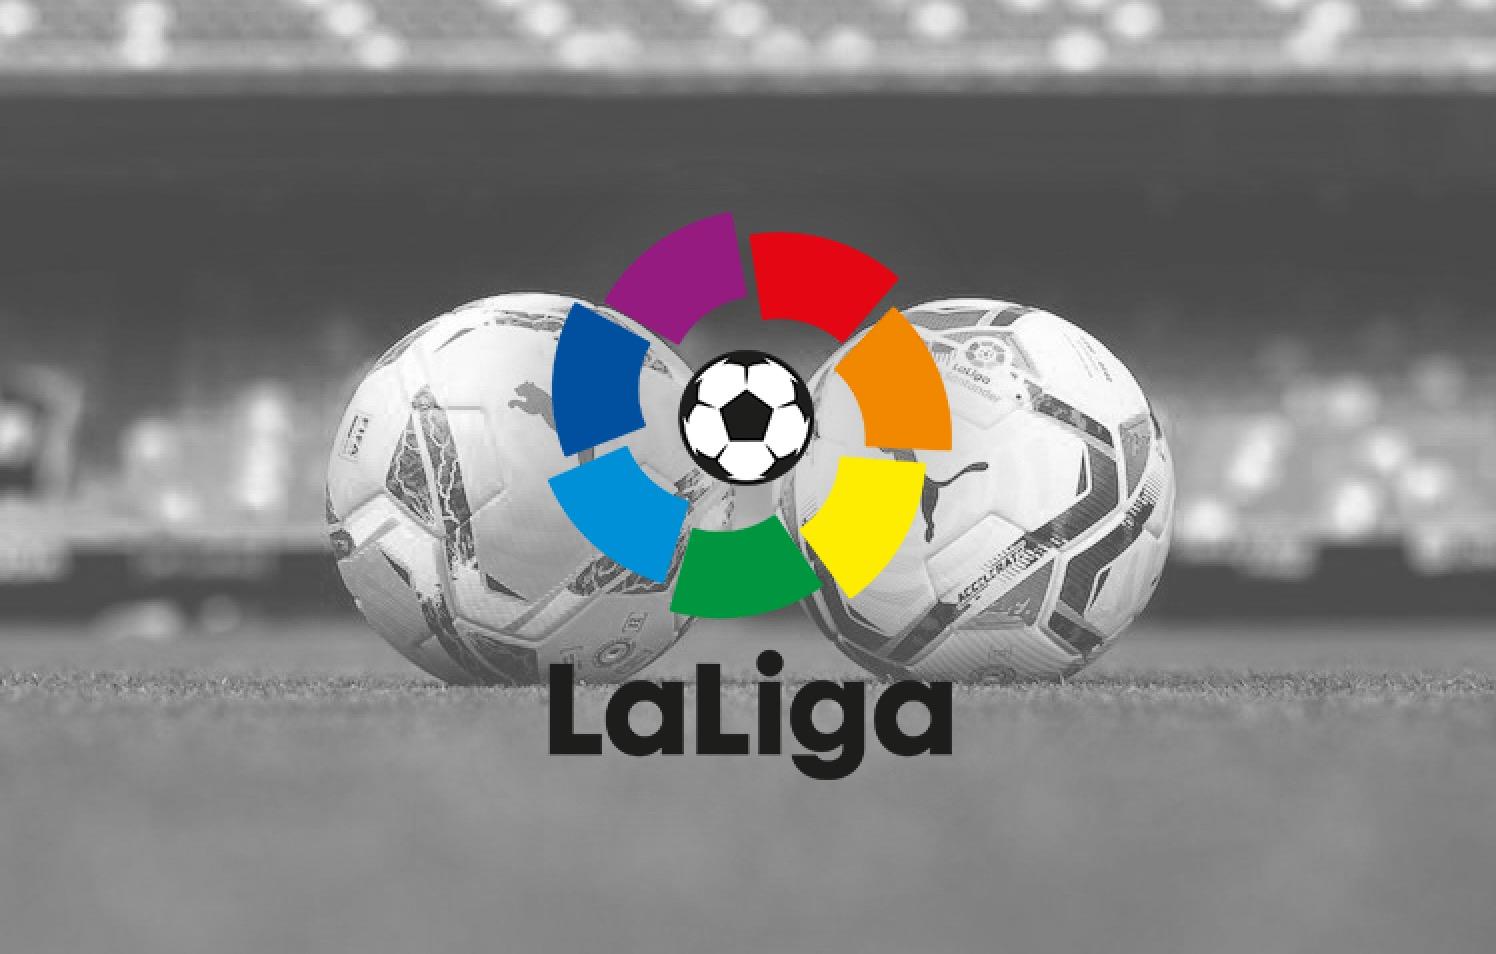 Calendrier Liga 2021 2022 Calendrier Liga 2020 21 : le Real Madrid débutera en deuxième journée